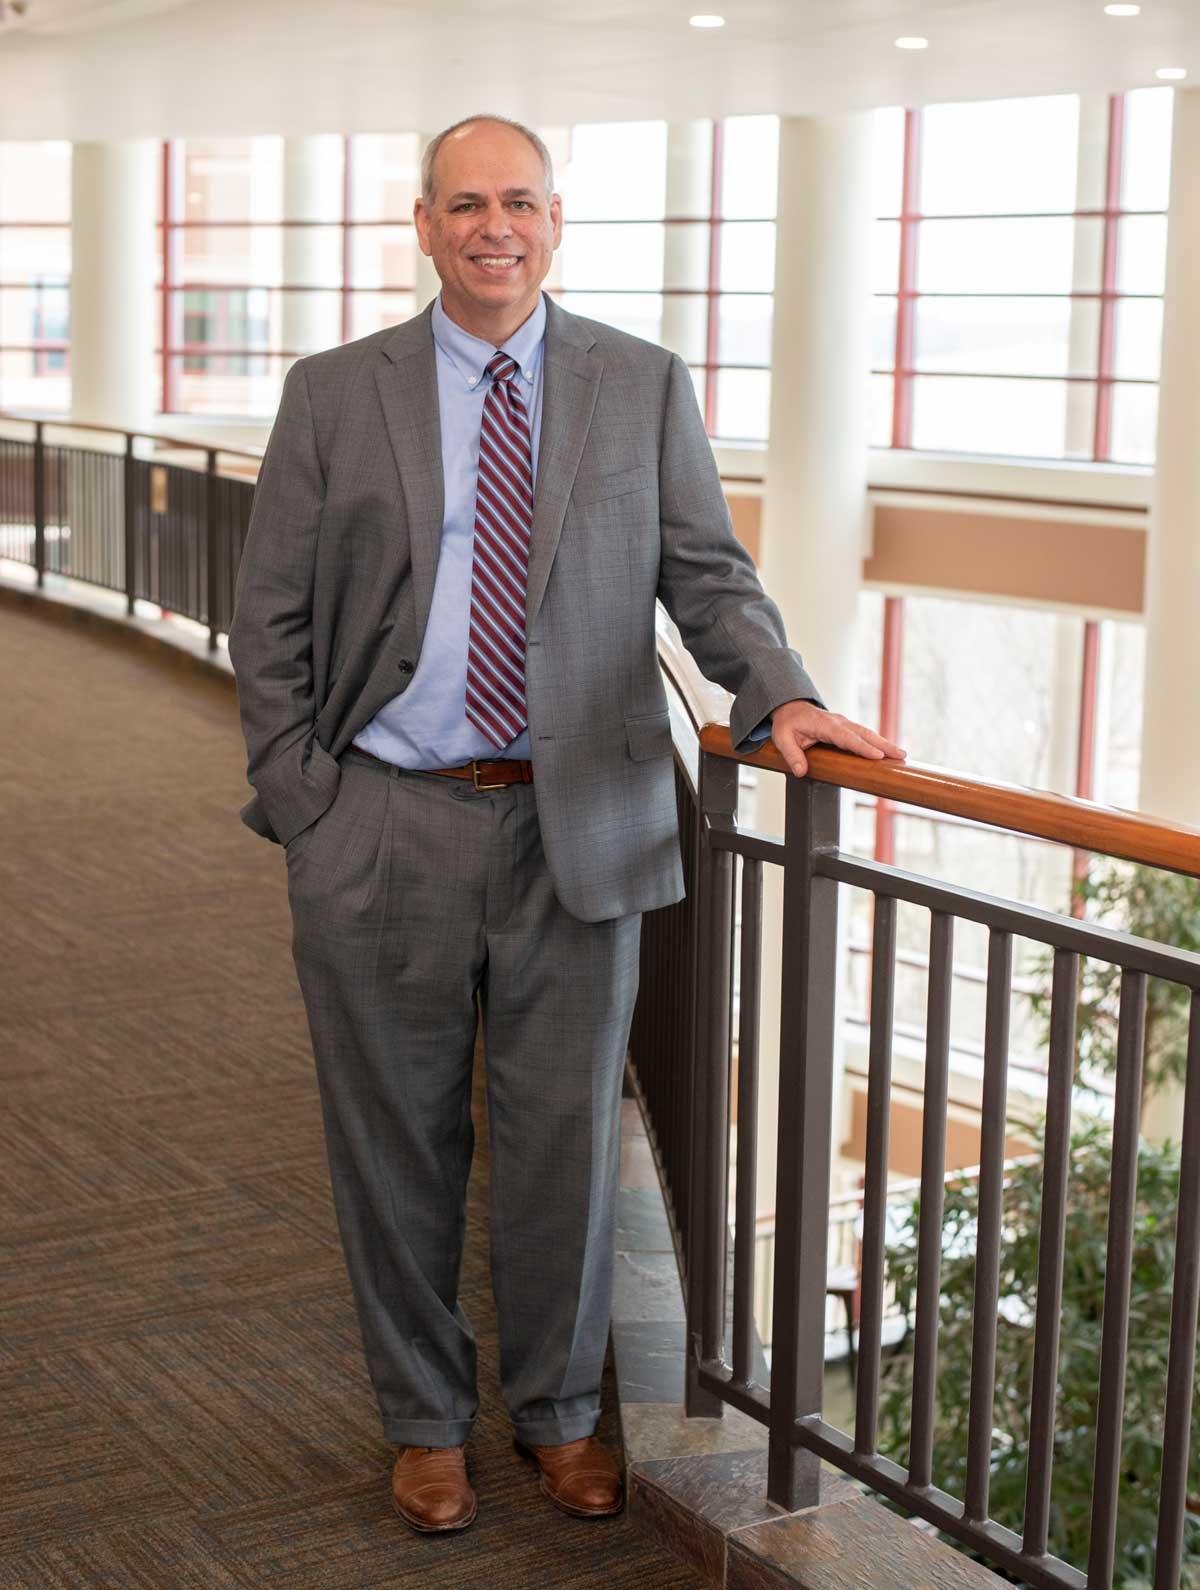 Picture of Larry Shackelford of Washington Regional